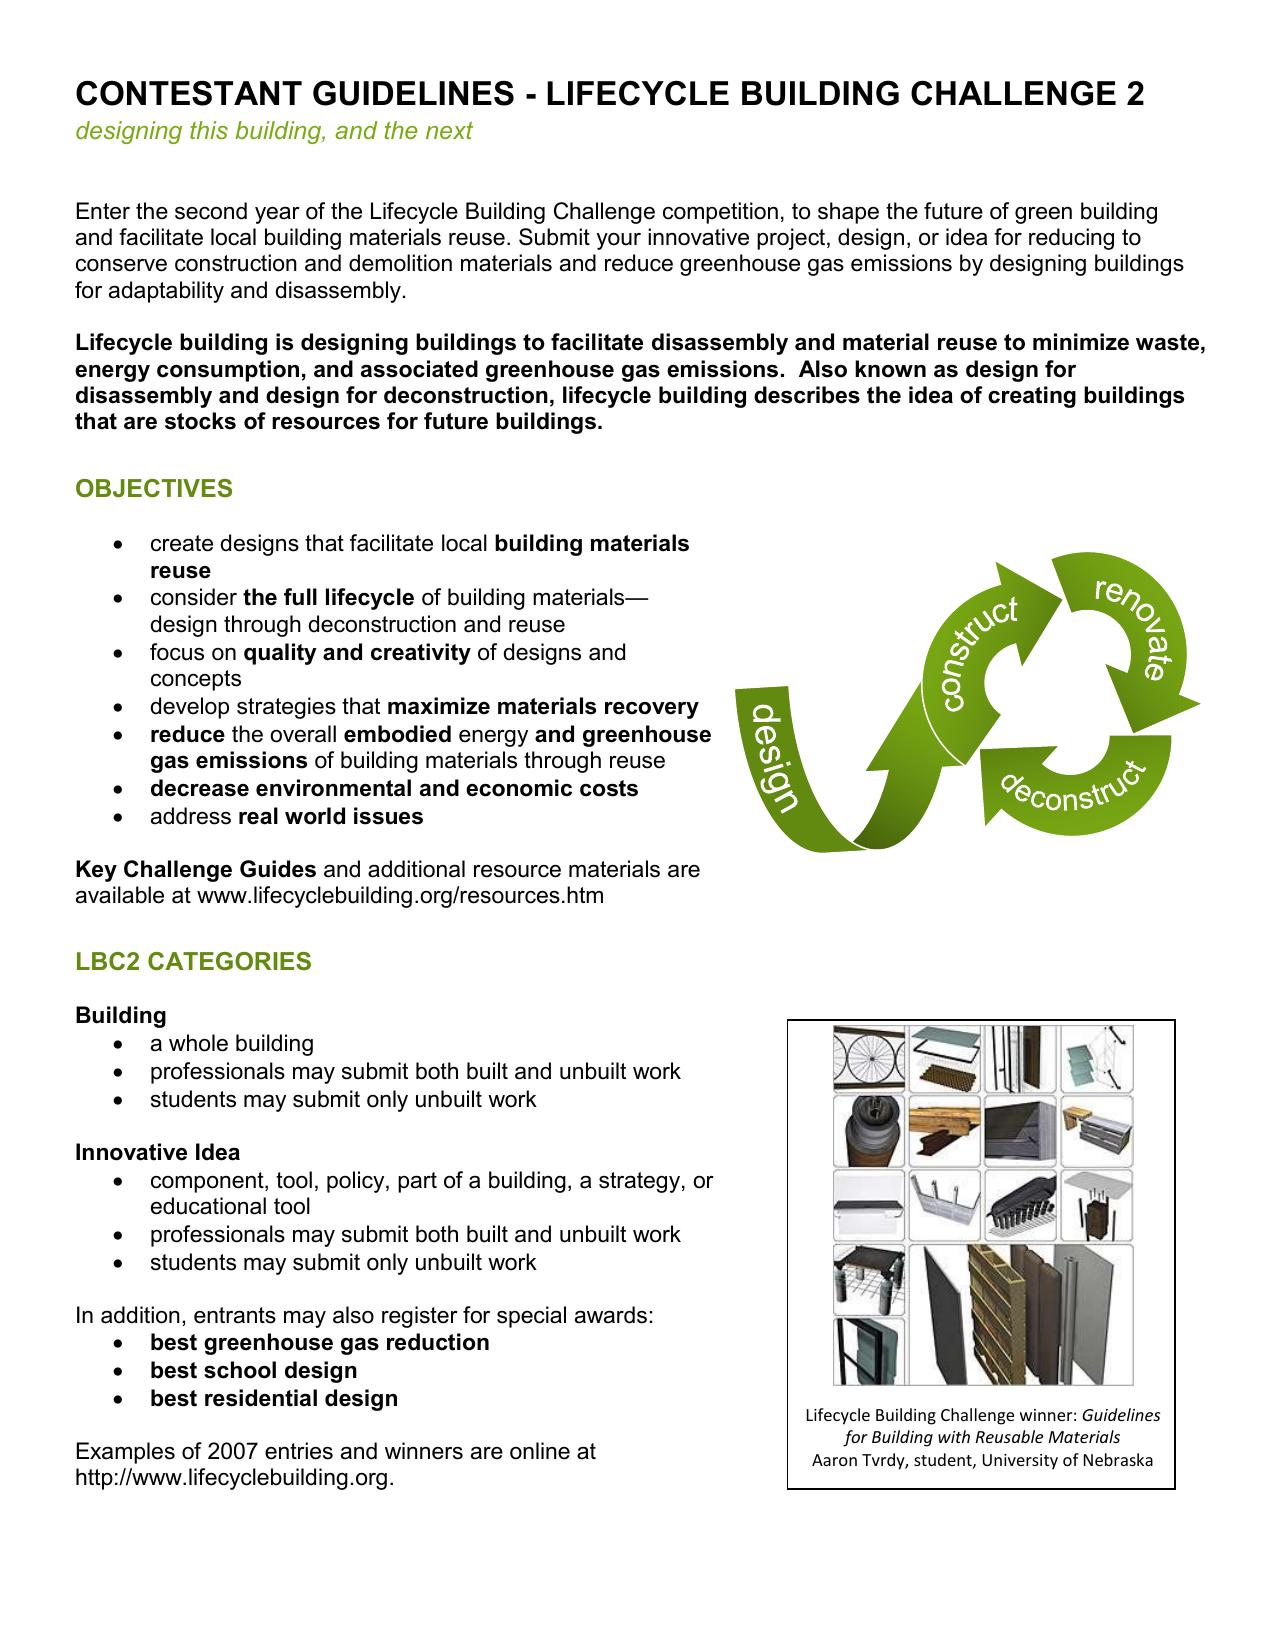 lbc2 categories - Lifecycle Building Challenge